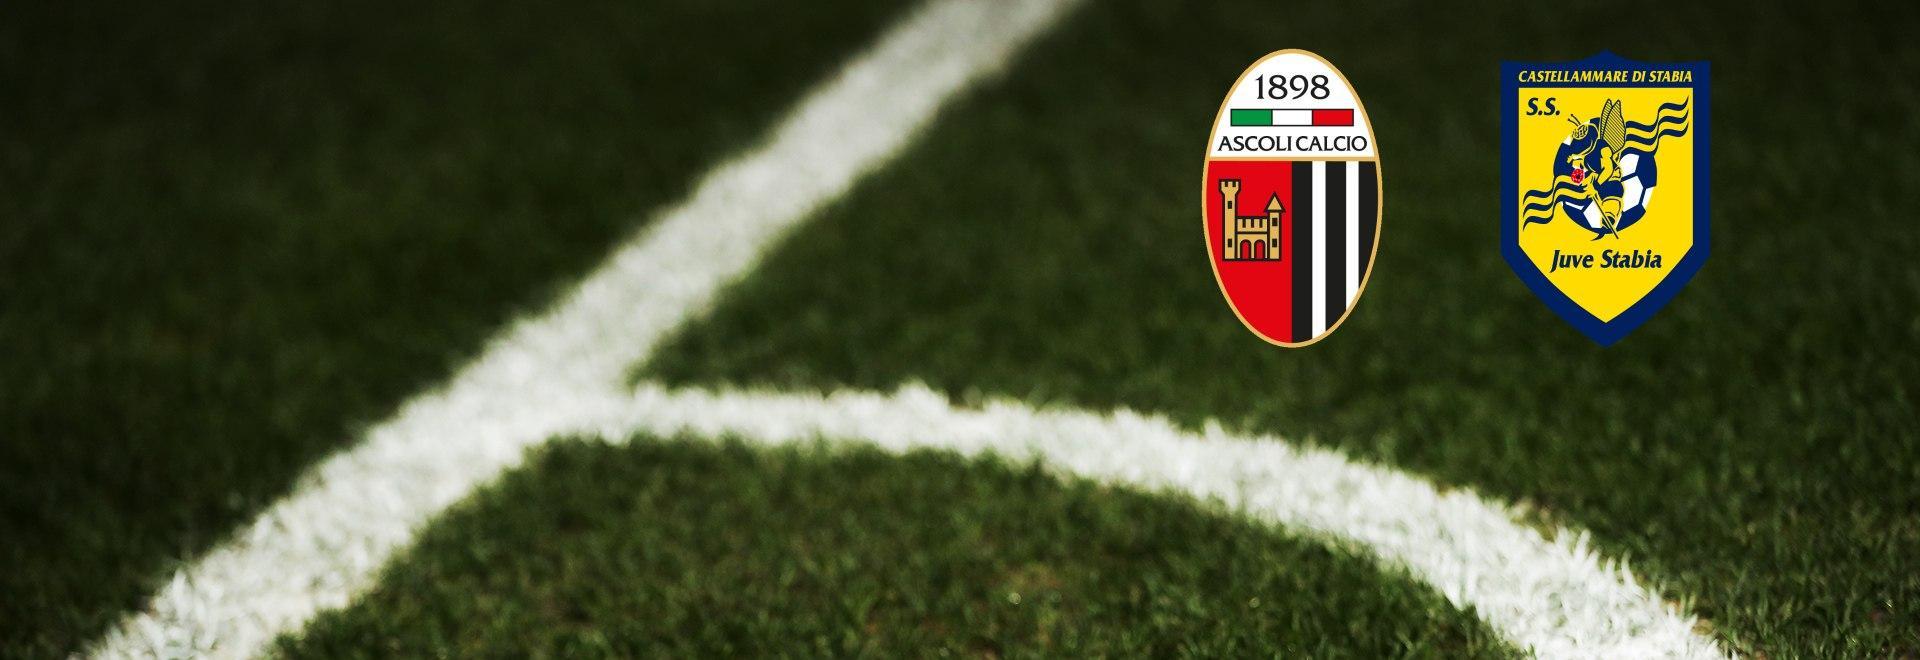 Ascoli - Juve Stabia. 23a g.